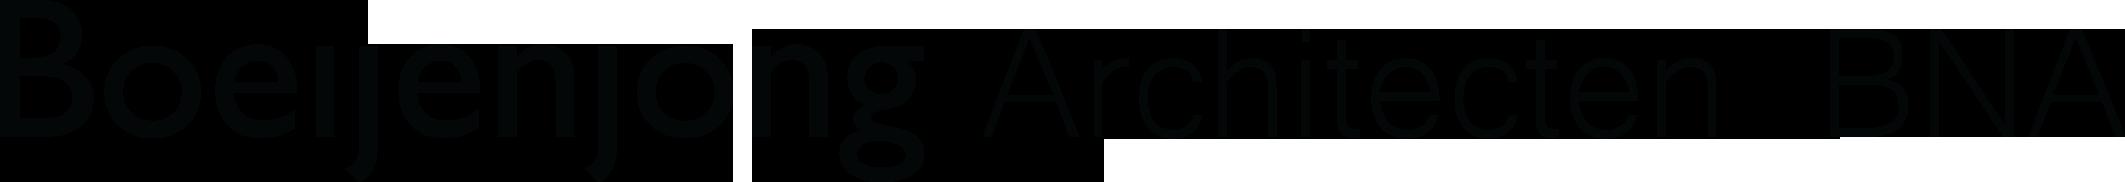 Boeijenjong Architecten Logo